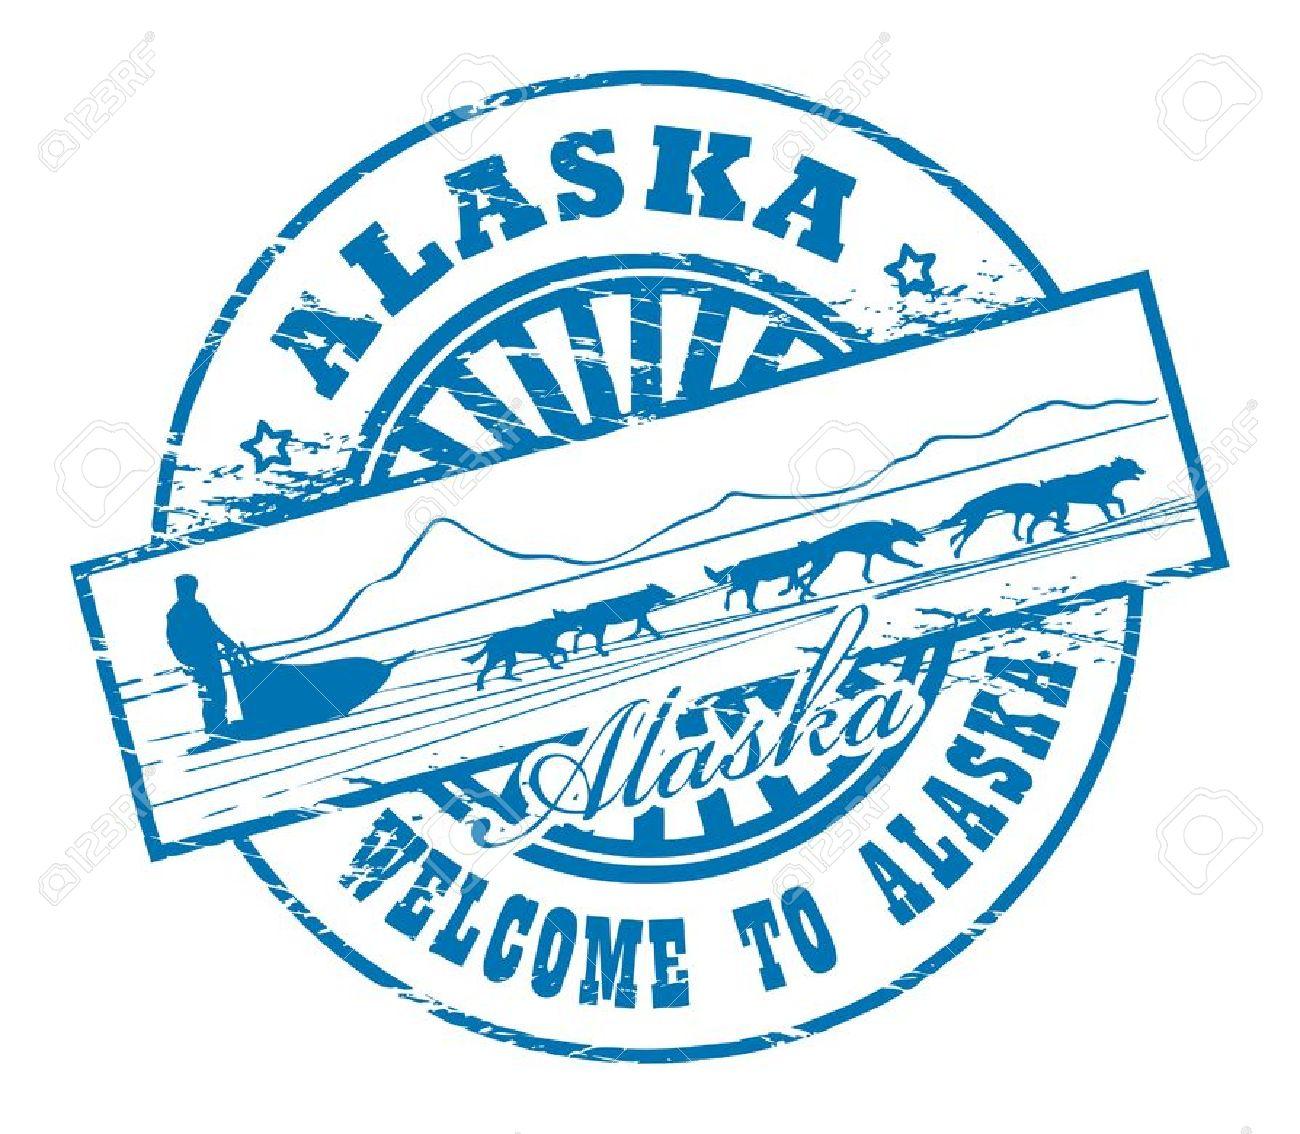 Clipart of alaska clipart Alaska cruise clip art - ClipartFest clipart